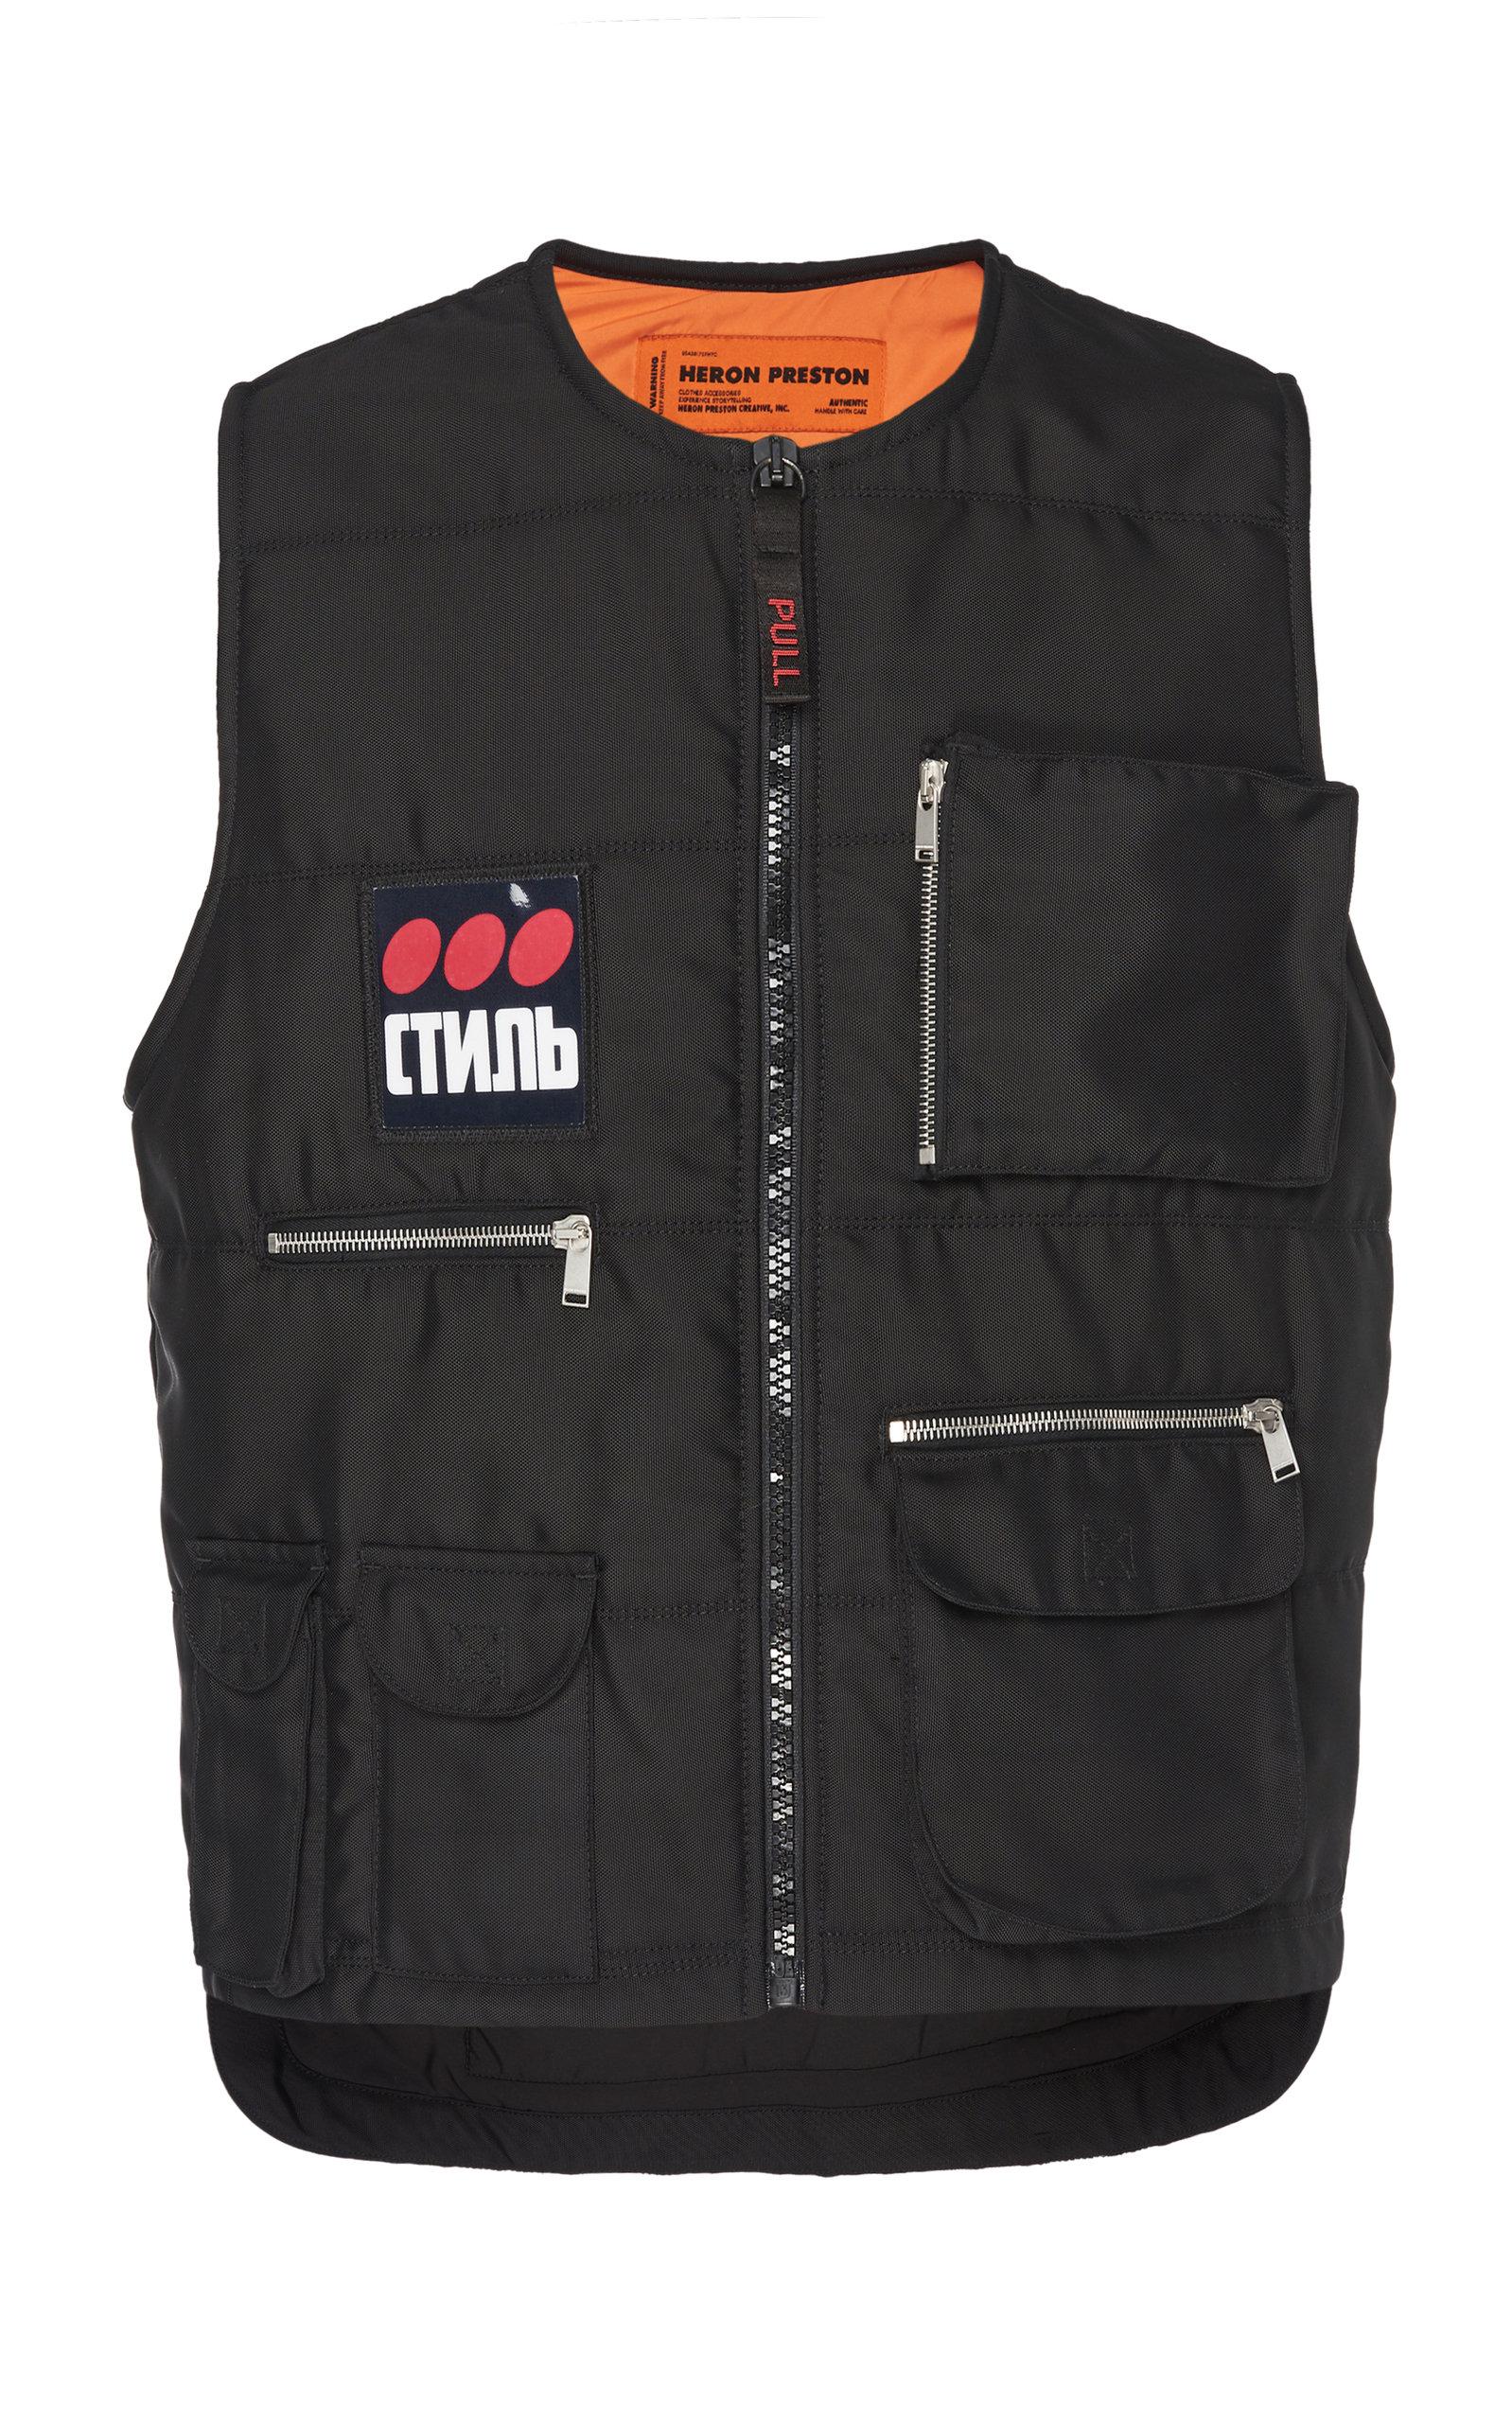 Heron Preston Coats Multipocket Utilitarian Nylon Vest